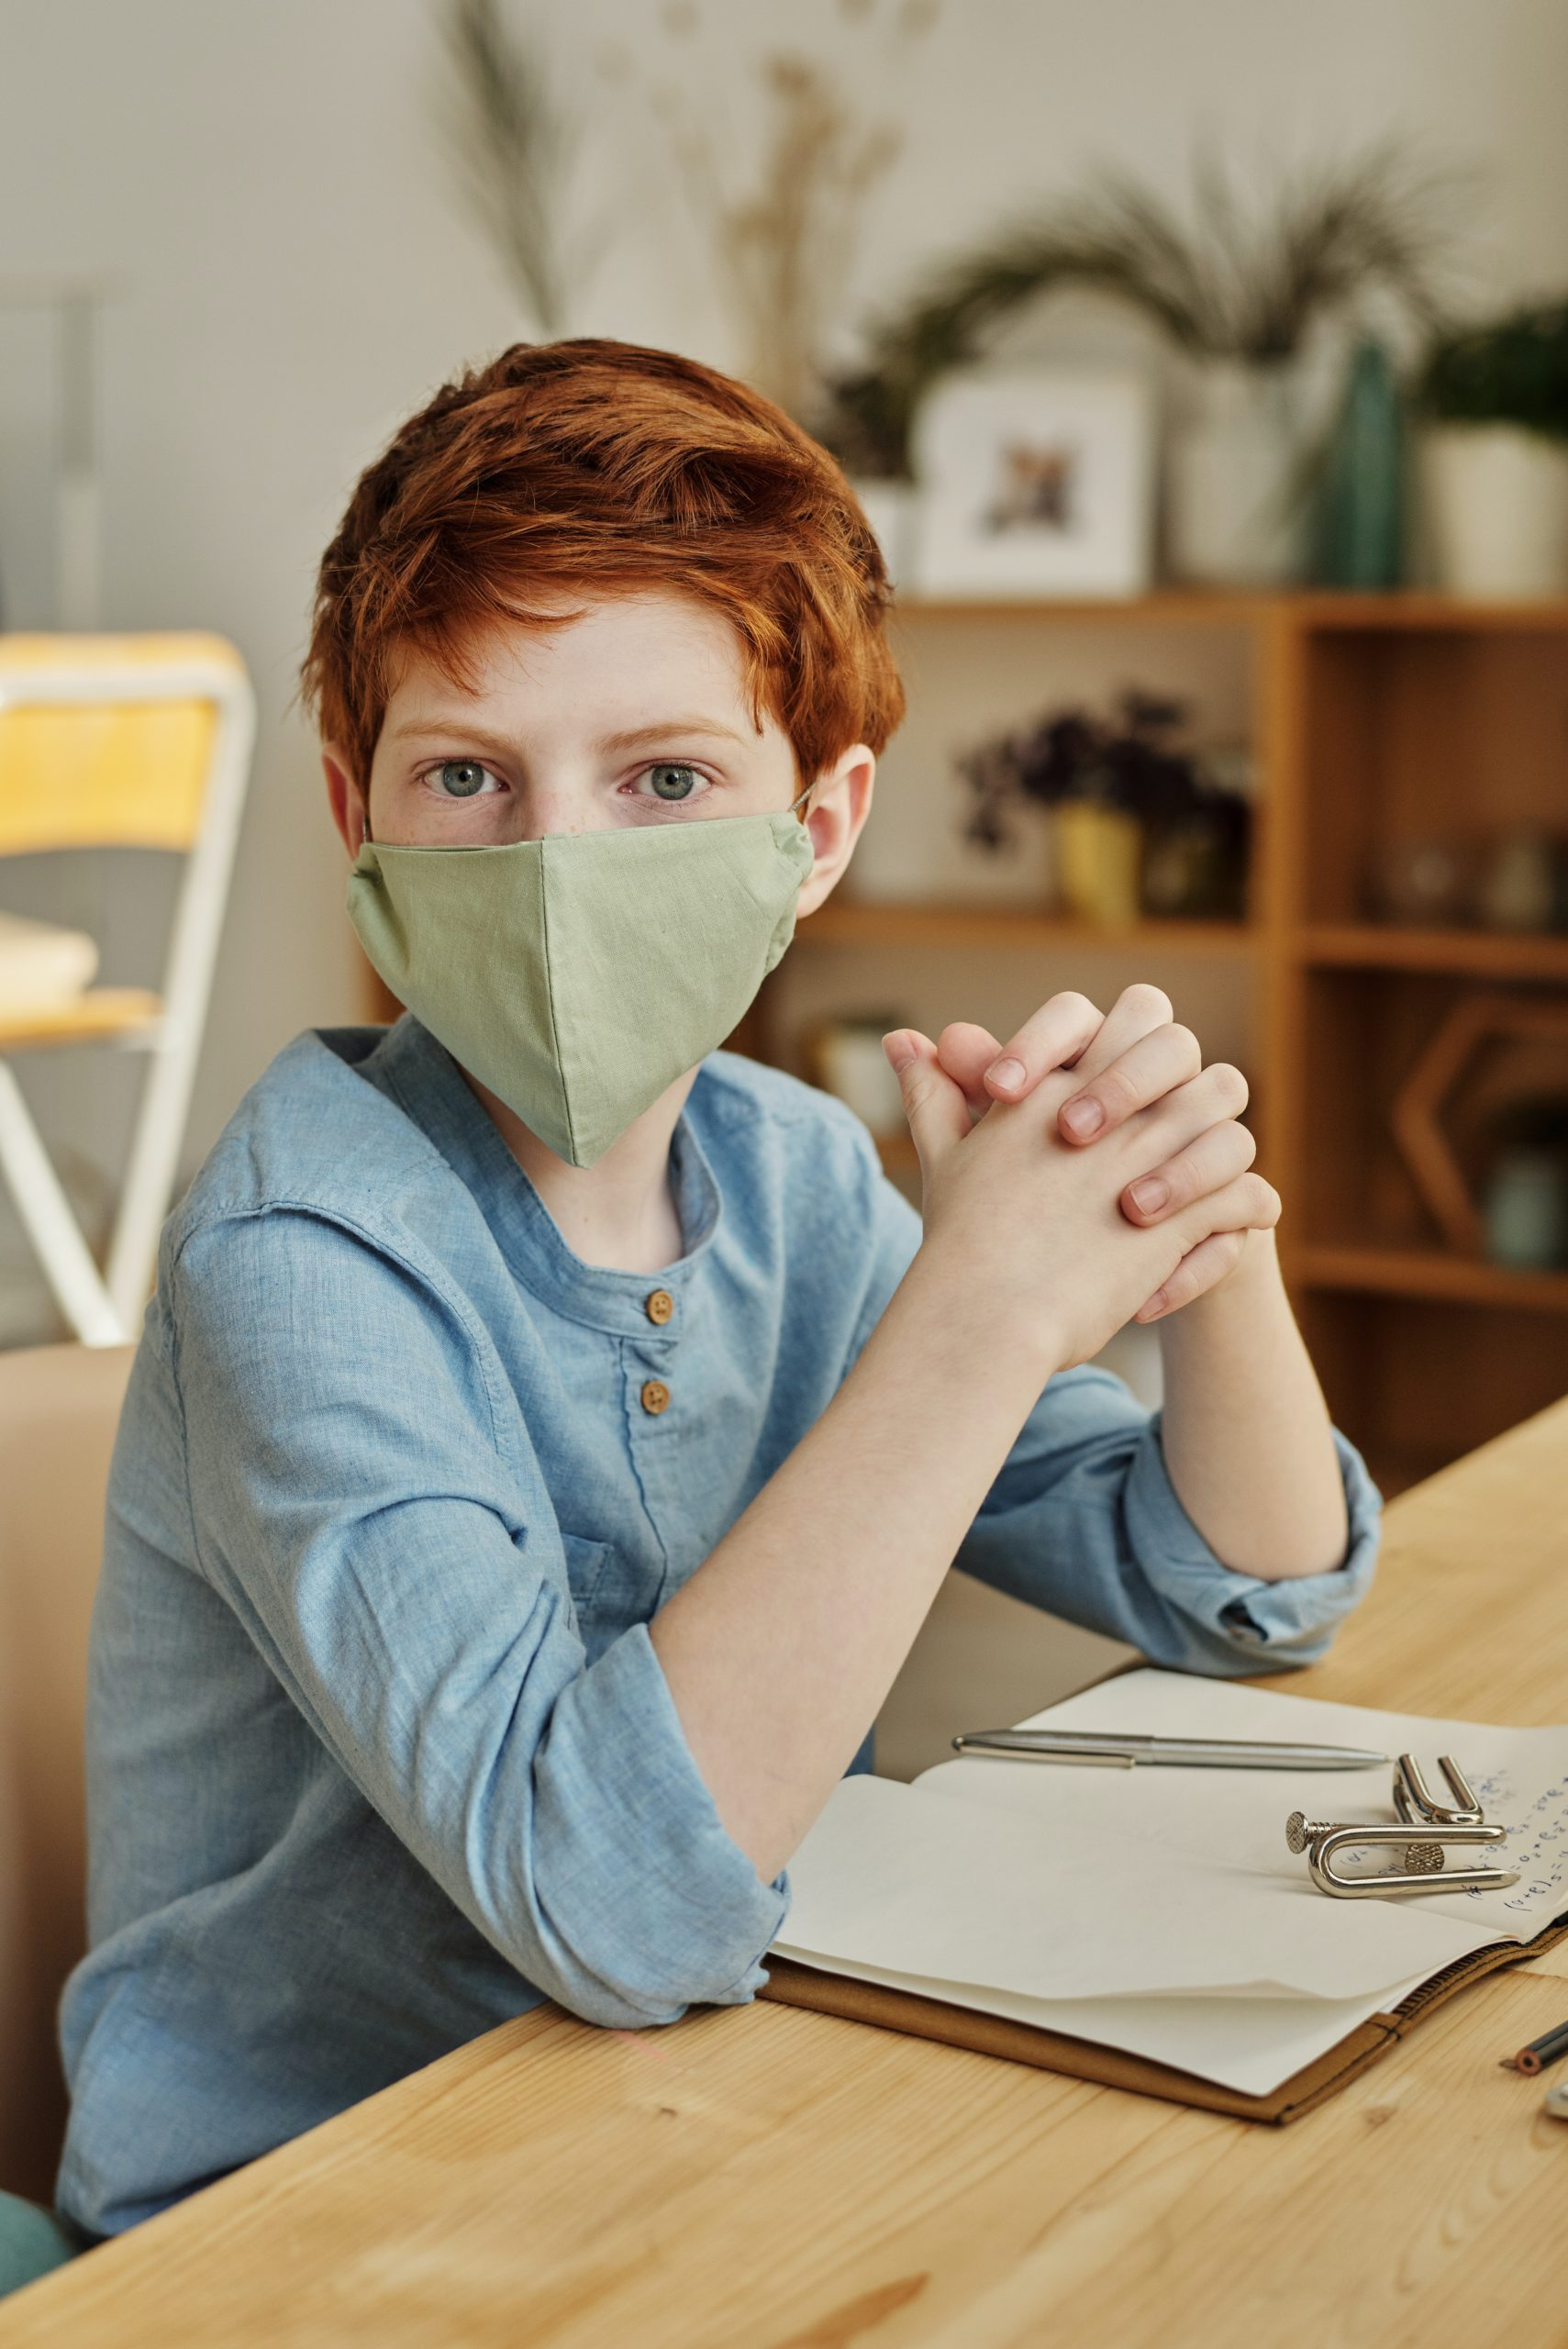 face masks at school